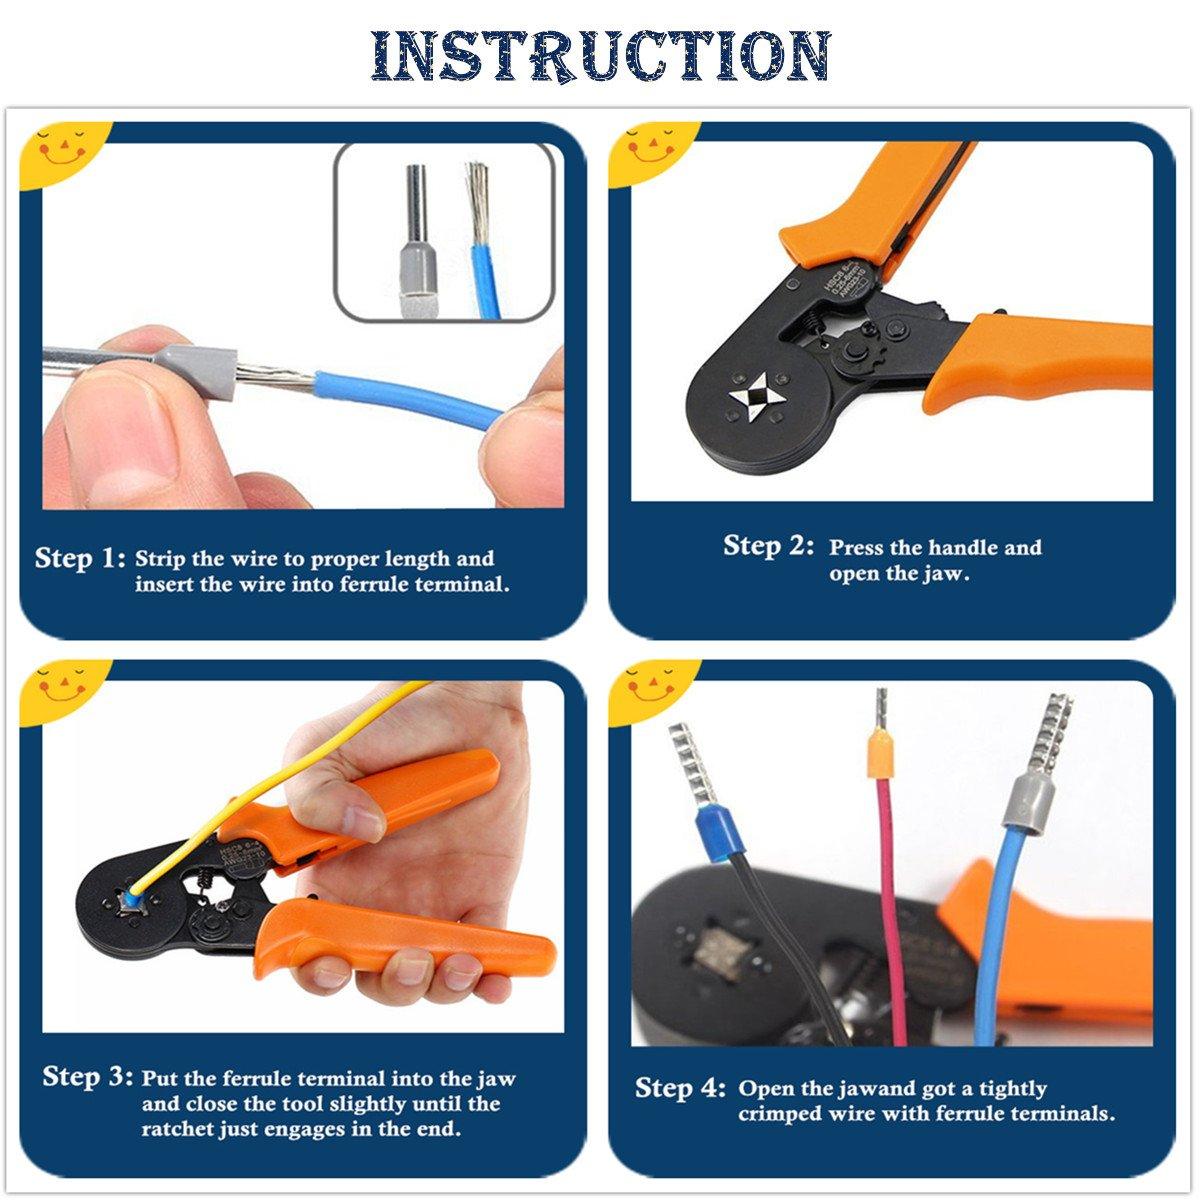 Proper Wire Crimping - Free Download Wiring Diagram